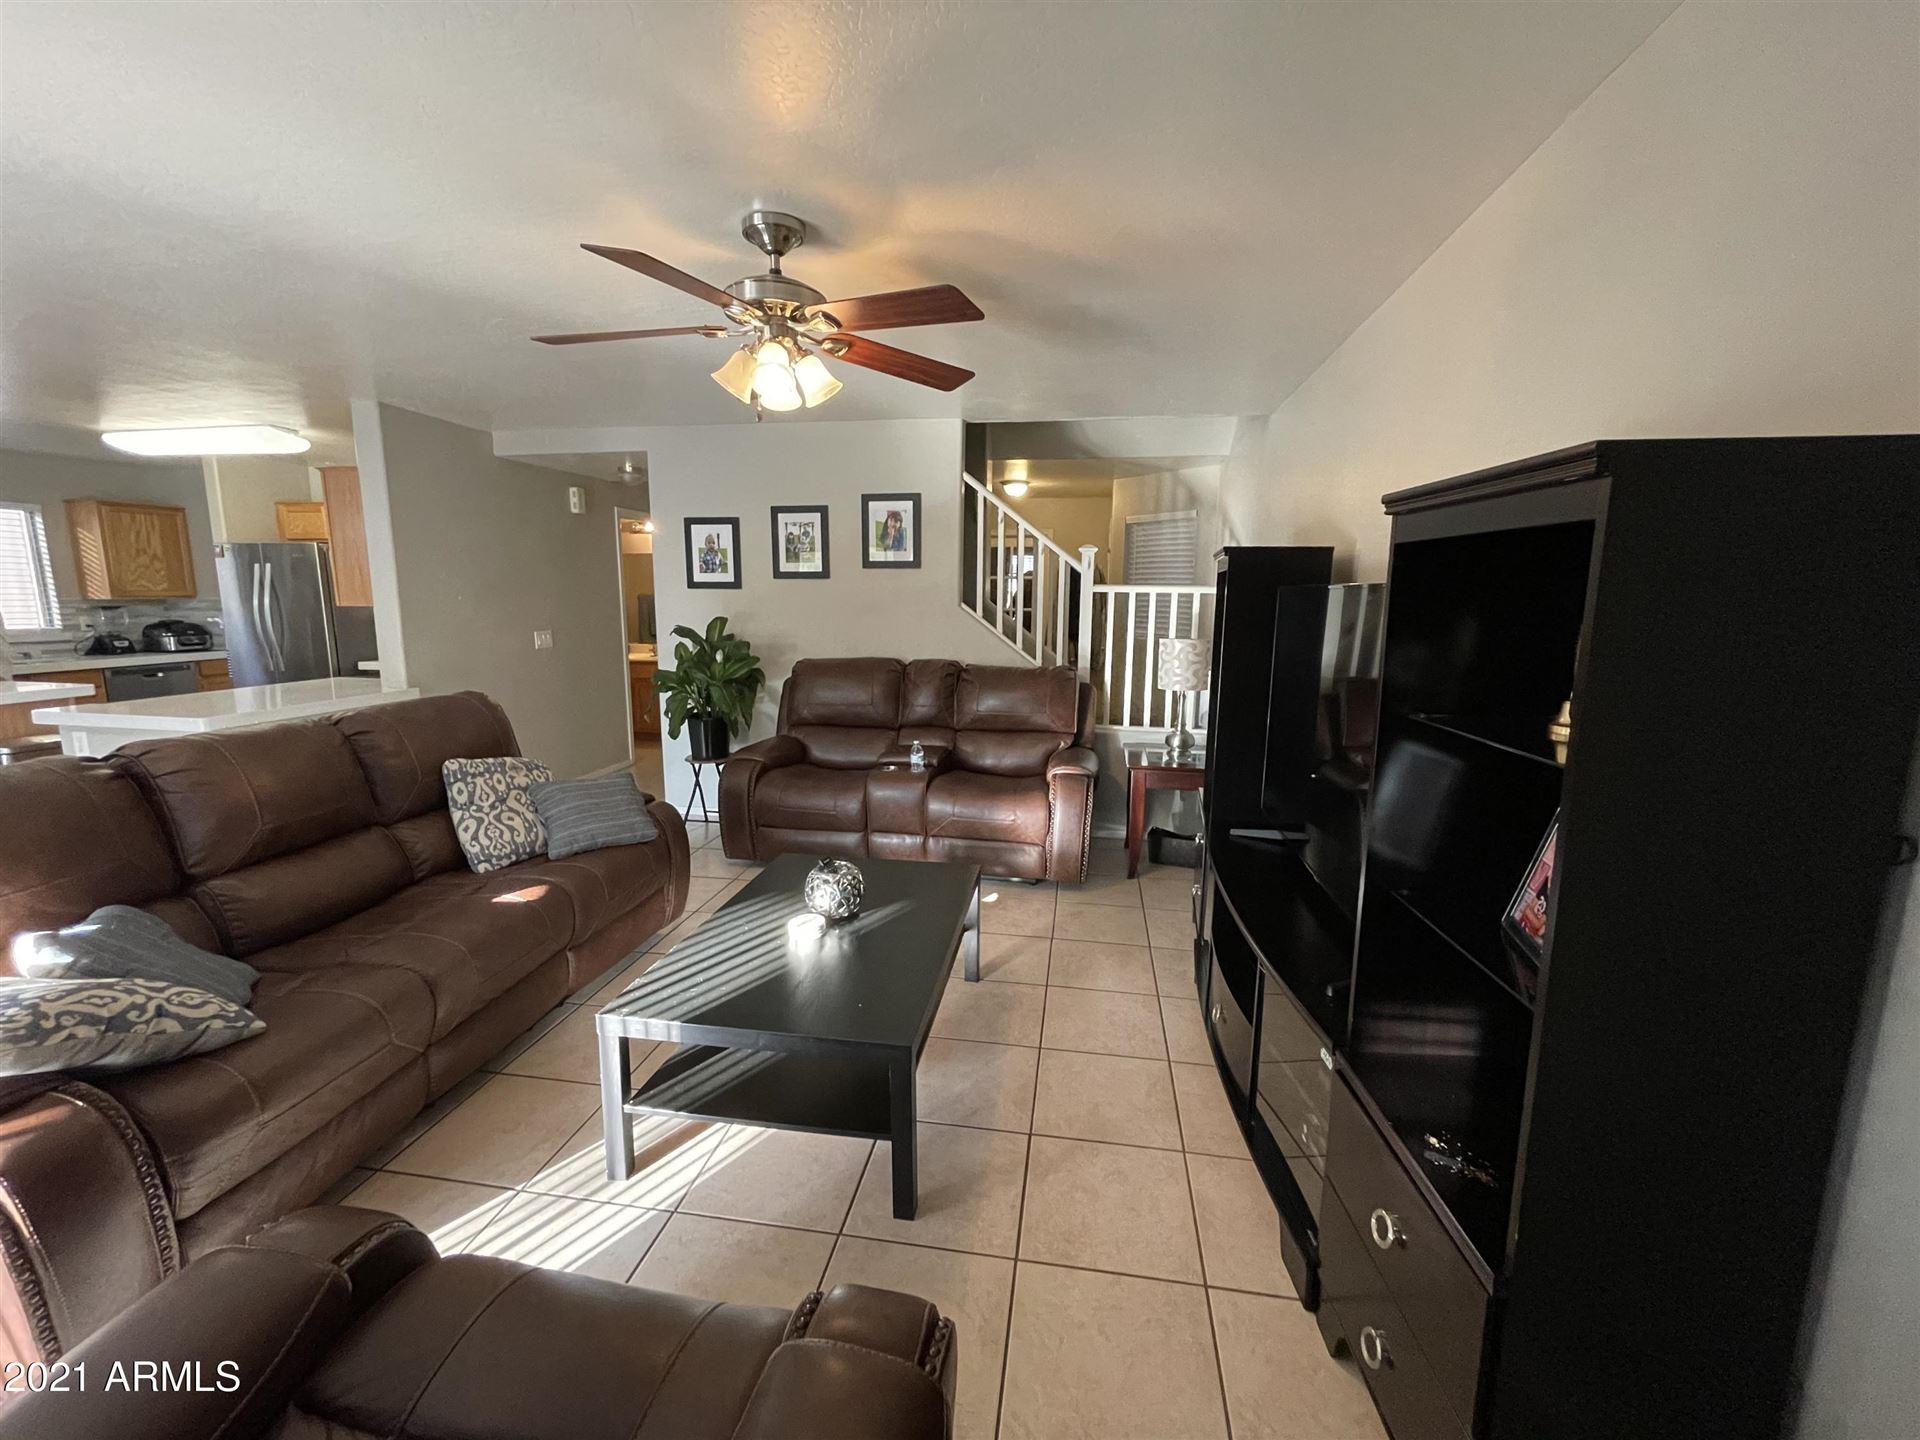 Photo of 14210 N 127th Avenue, El Mirage, AZ 85335 (MLS # 6227305)